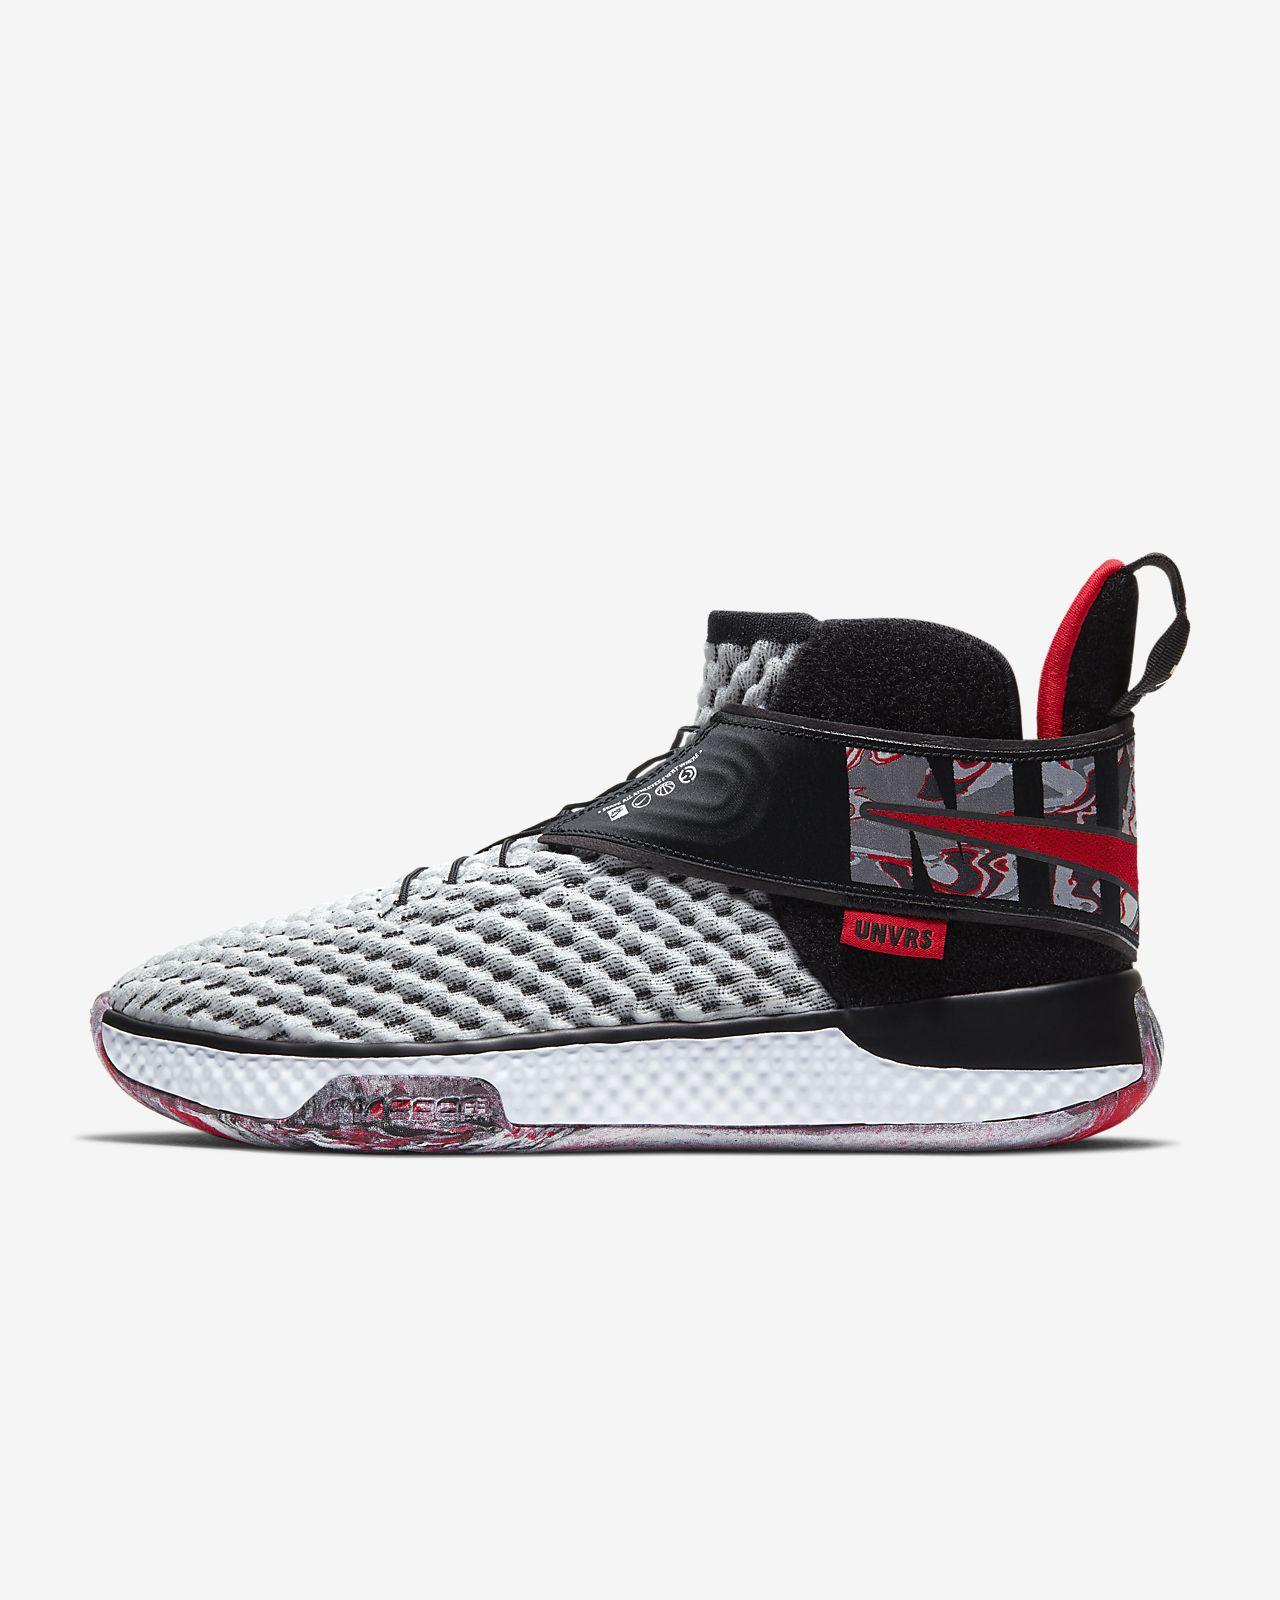 Nike Air Zoom UNVRS FlyEase basketsko